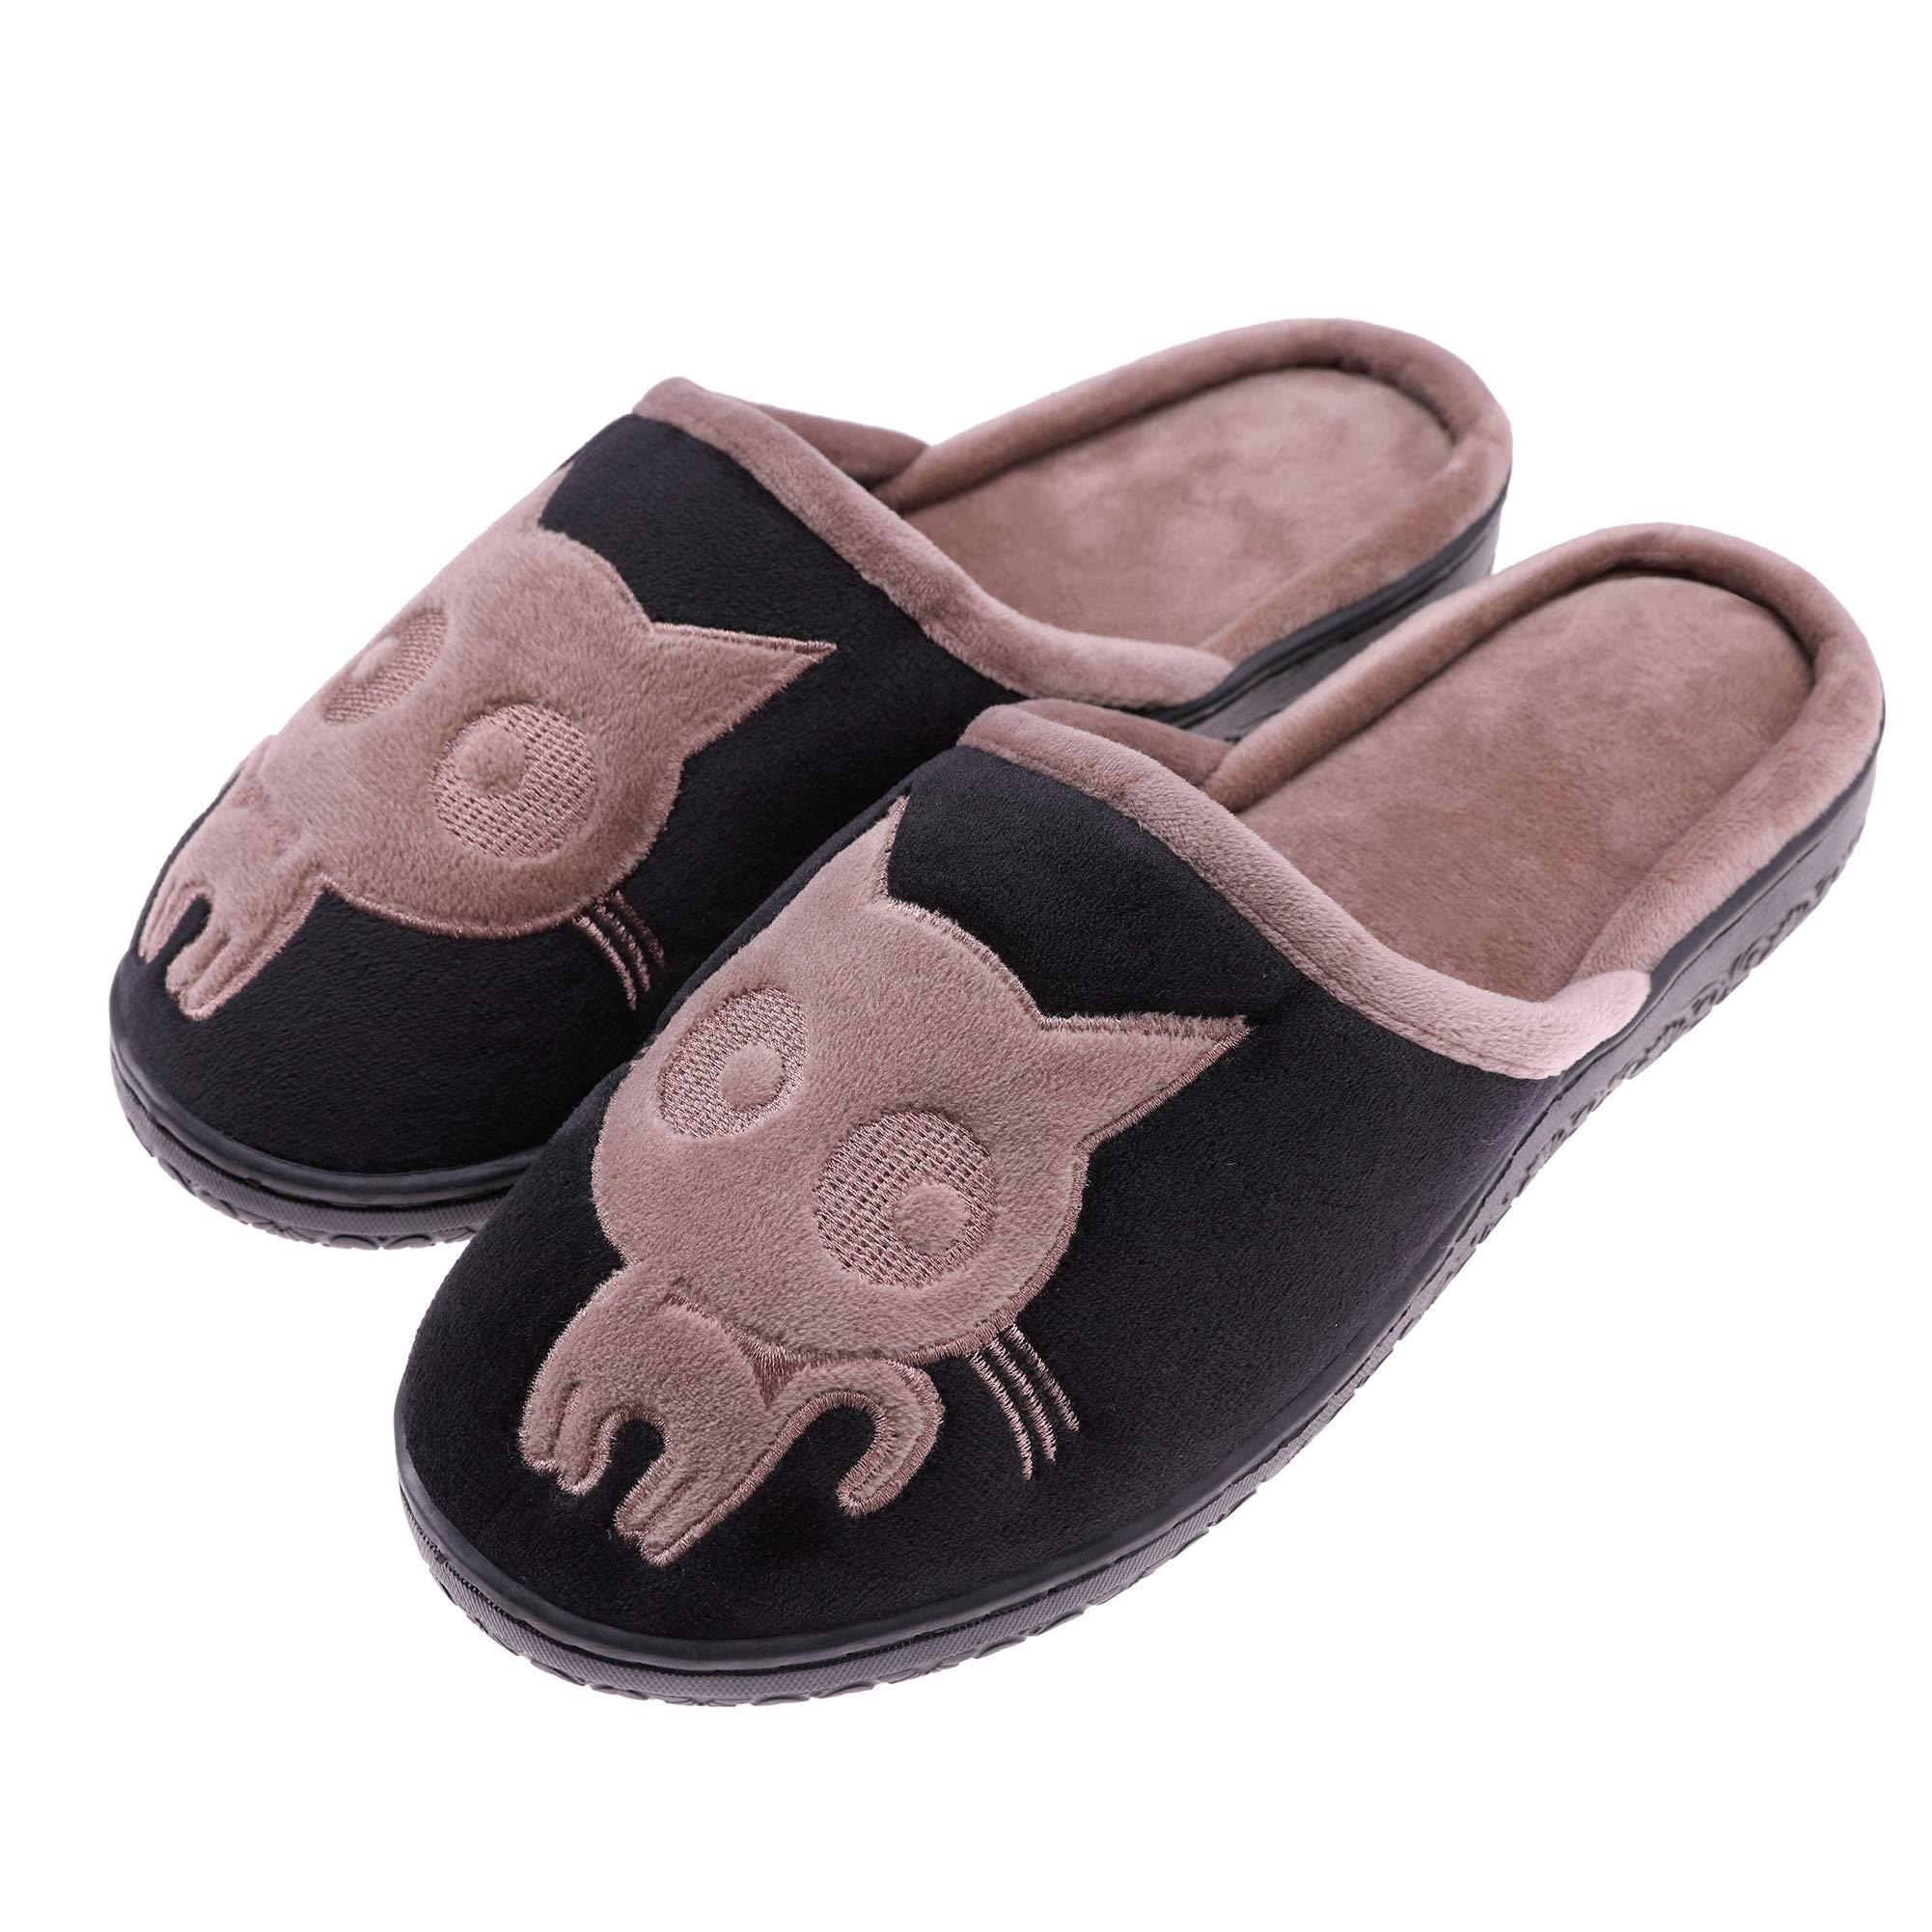 TRUEHAN Womens Cute Cat Plush Animal Winter Warm Bedroom Shoes Non Slip Velvet House Slippers (XL/ 9-10 B(M) US/EU 39-40, Black)